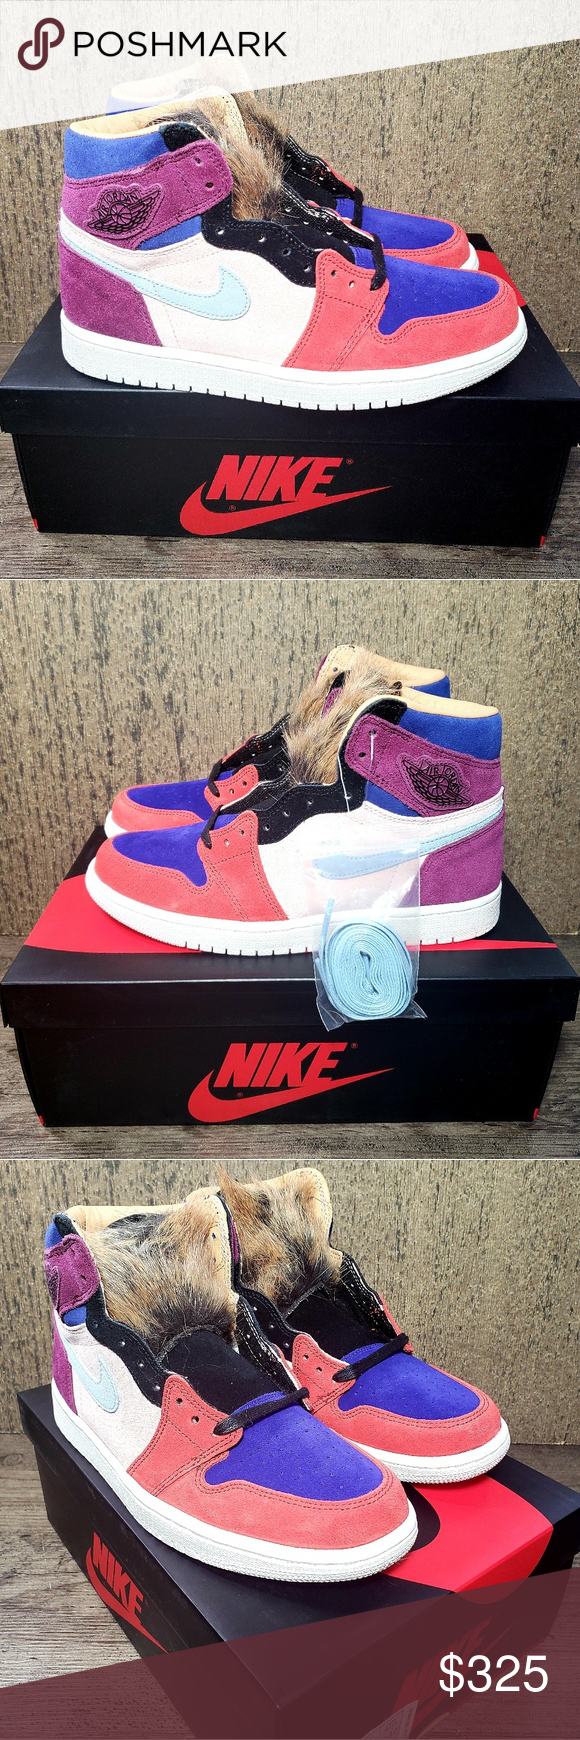 premium selection 1dc4a b4c90 Nike Air Jordan 1 High OG Court Lux Aleali May NE BRAND-NEW ...